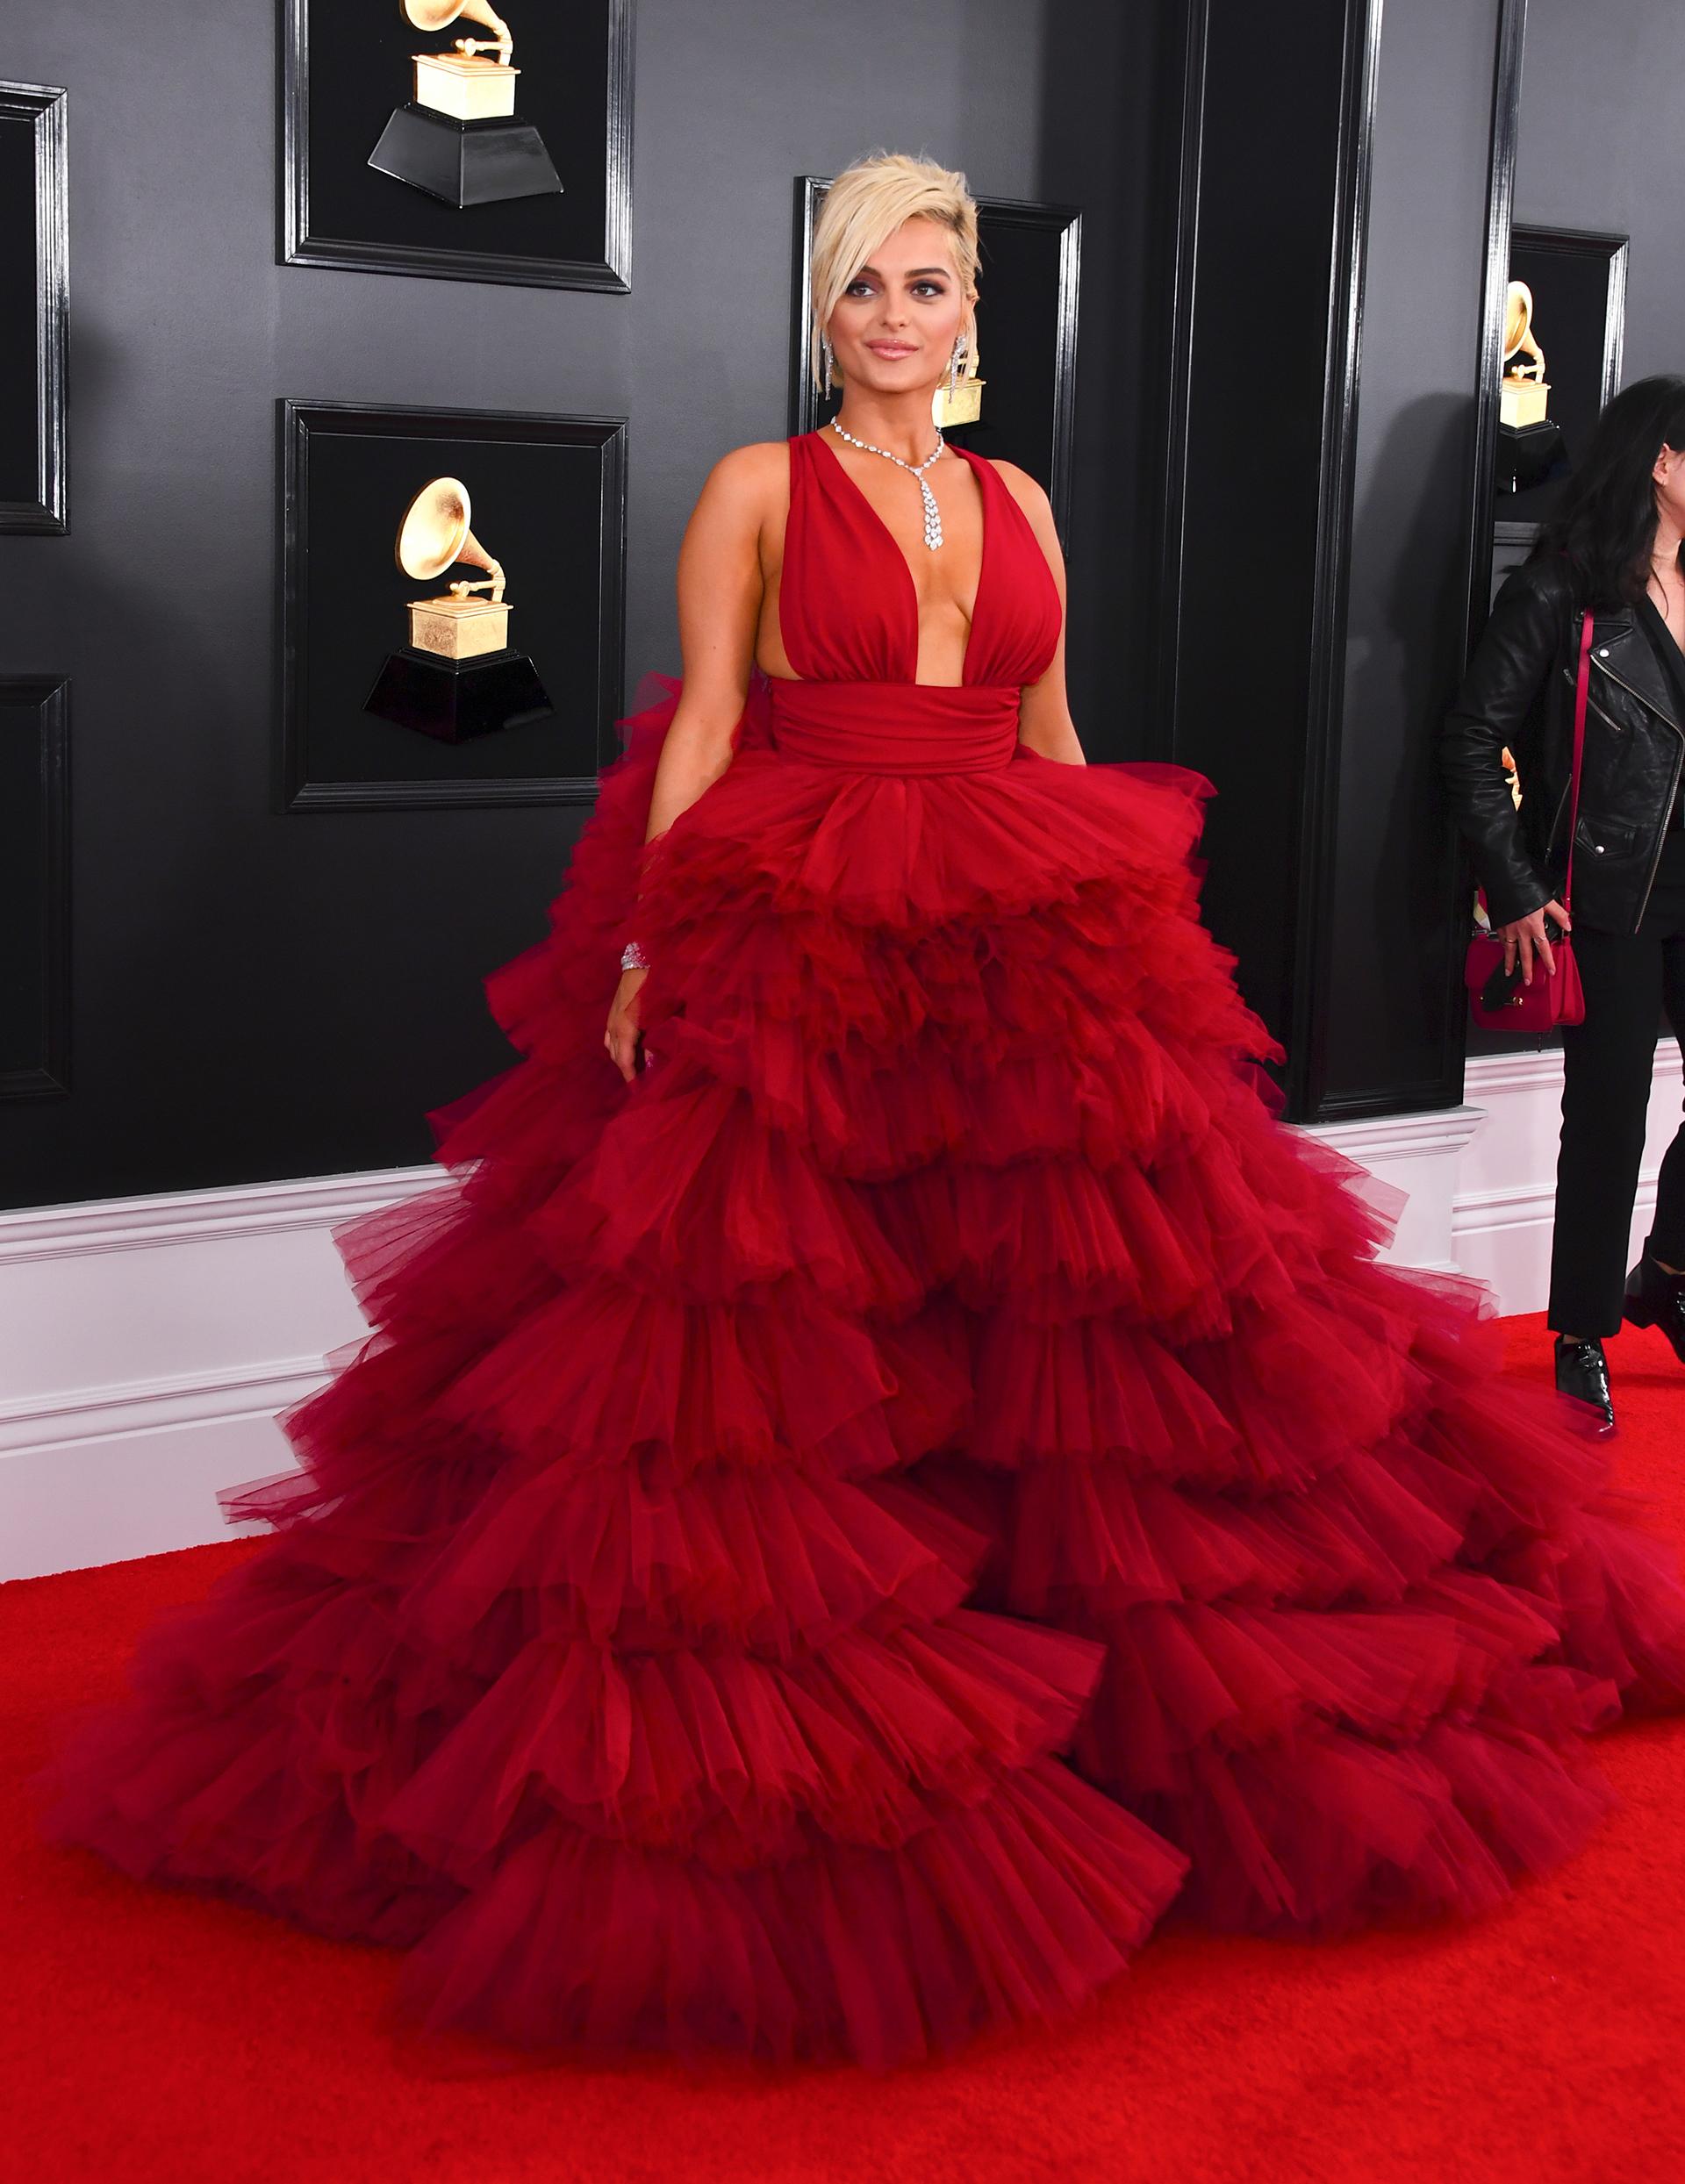 Bebe Rexha apostó a un vestido en rojo pasión vaporoso de tul en cascada. Completó el look con joyas plateadas, un brazalete, un collar y aros colgantes